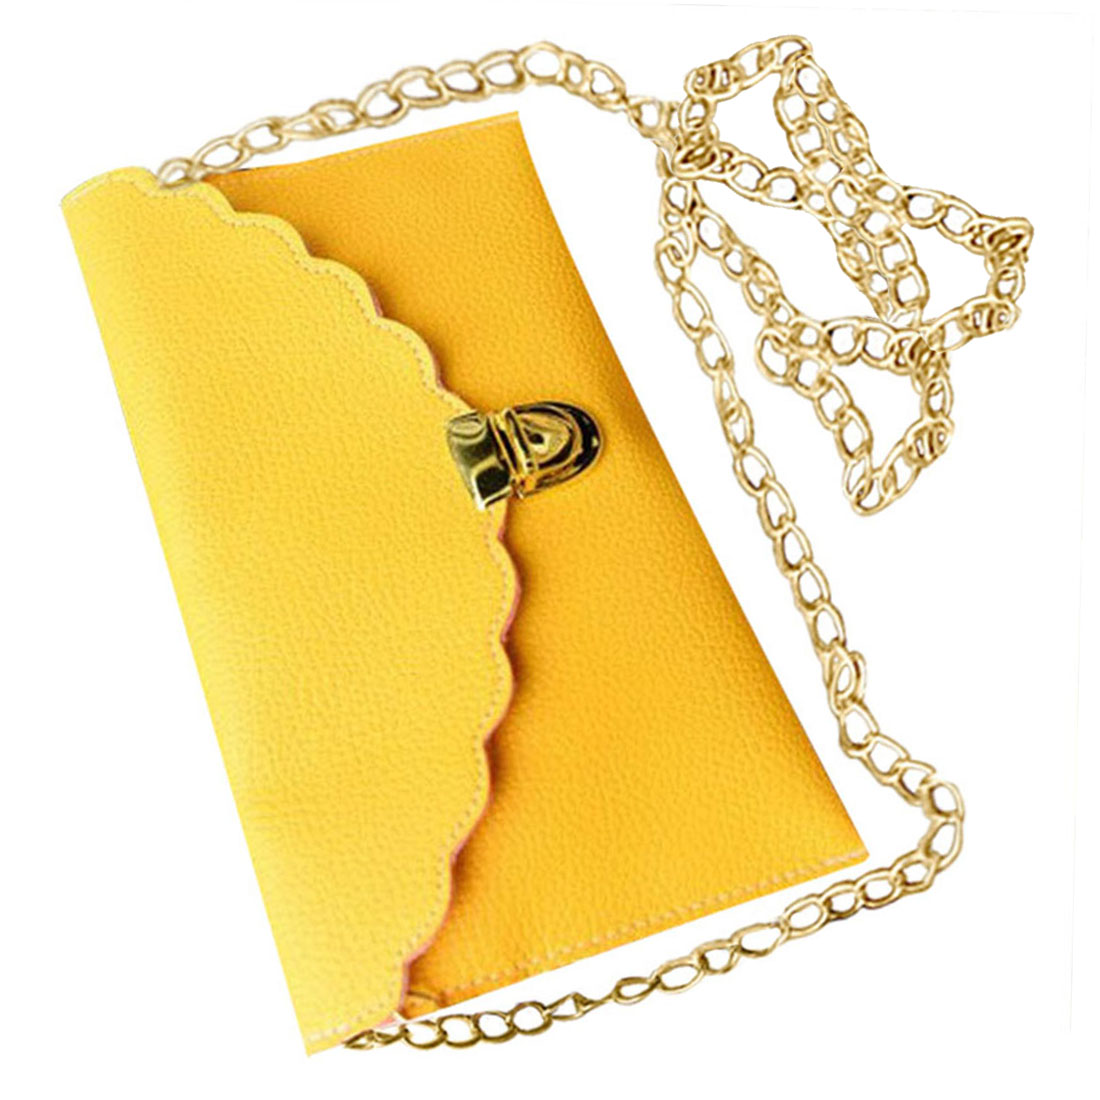 VSEN Hot Ladies Handbag Imitation Leather Shoulder Bag Fashion Wallet Long Metal Chain Lady Handbag vsen hot styleluggage bag replacement plastic 1 side rectangle buckle 10 pcs